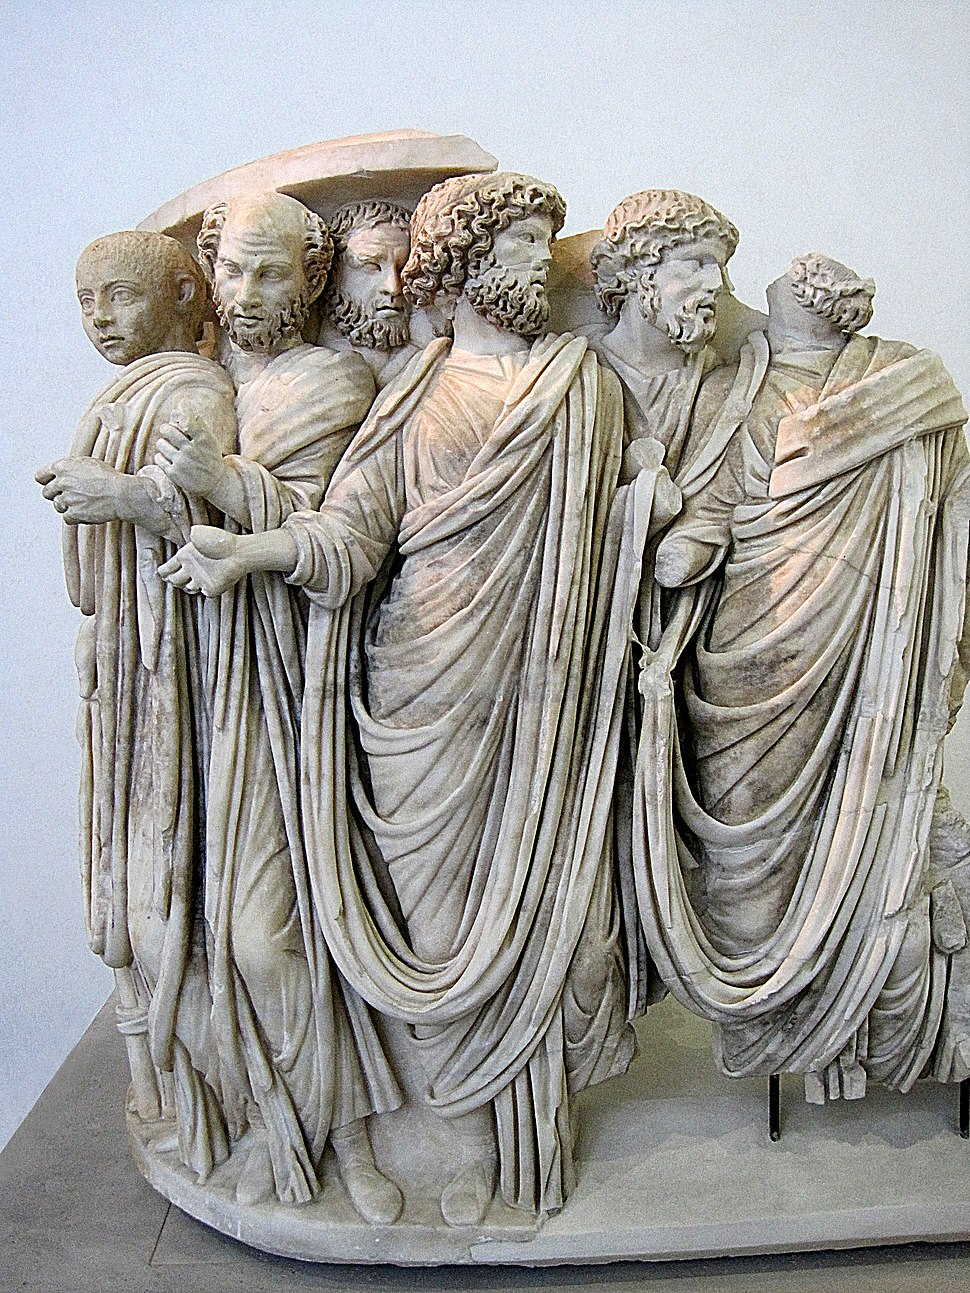 0 Sarcophage d'Acilia - Pal. Massimo alle Terme